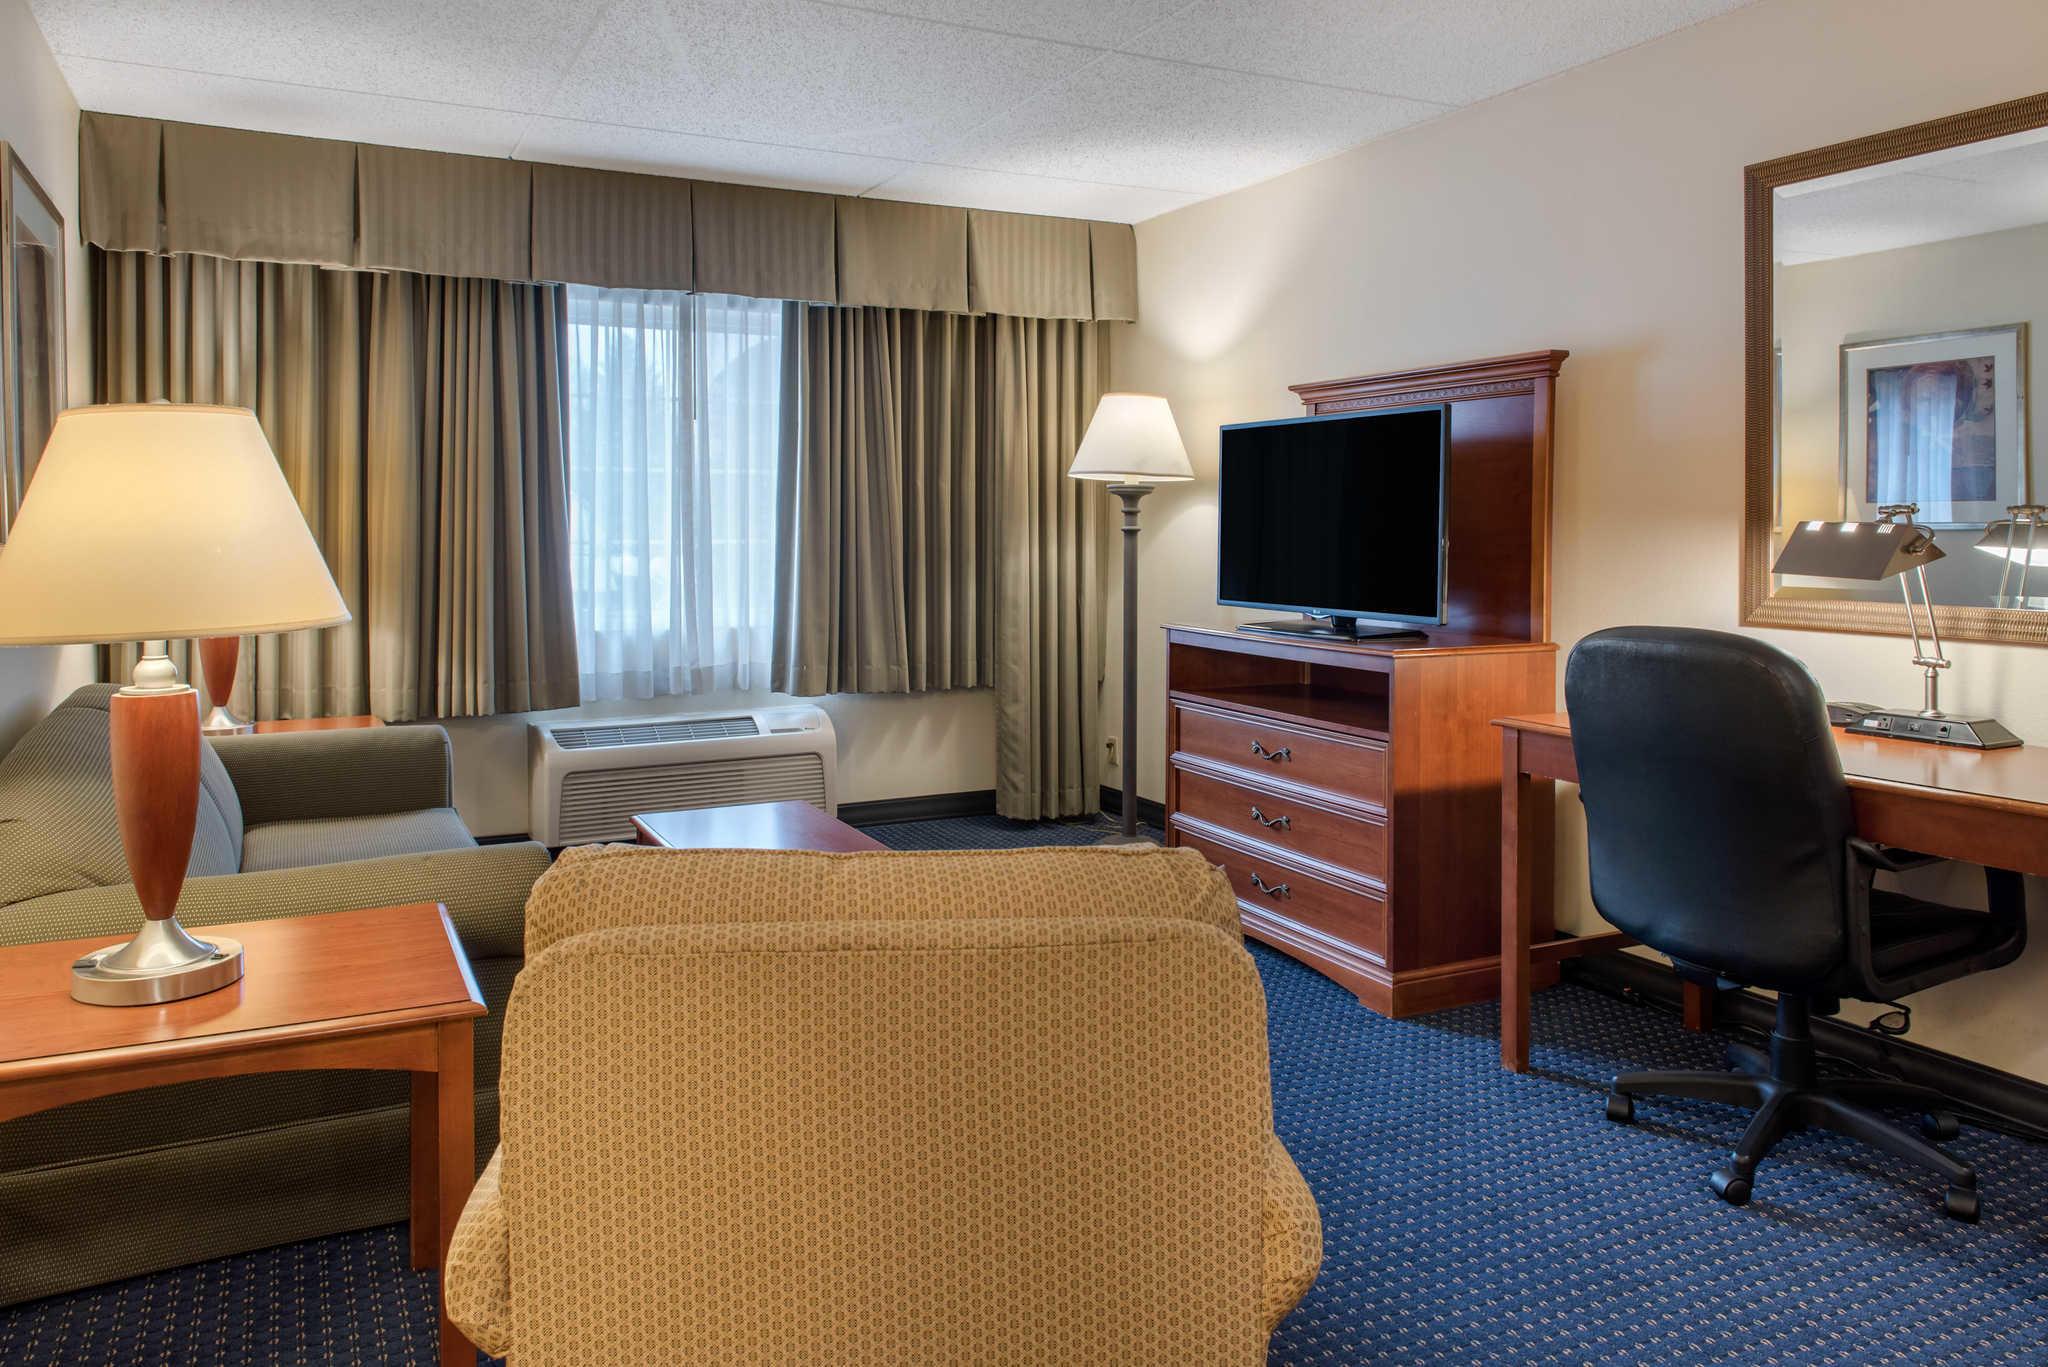 Quality Hotel - Cincinnati Blue Ash image 24